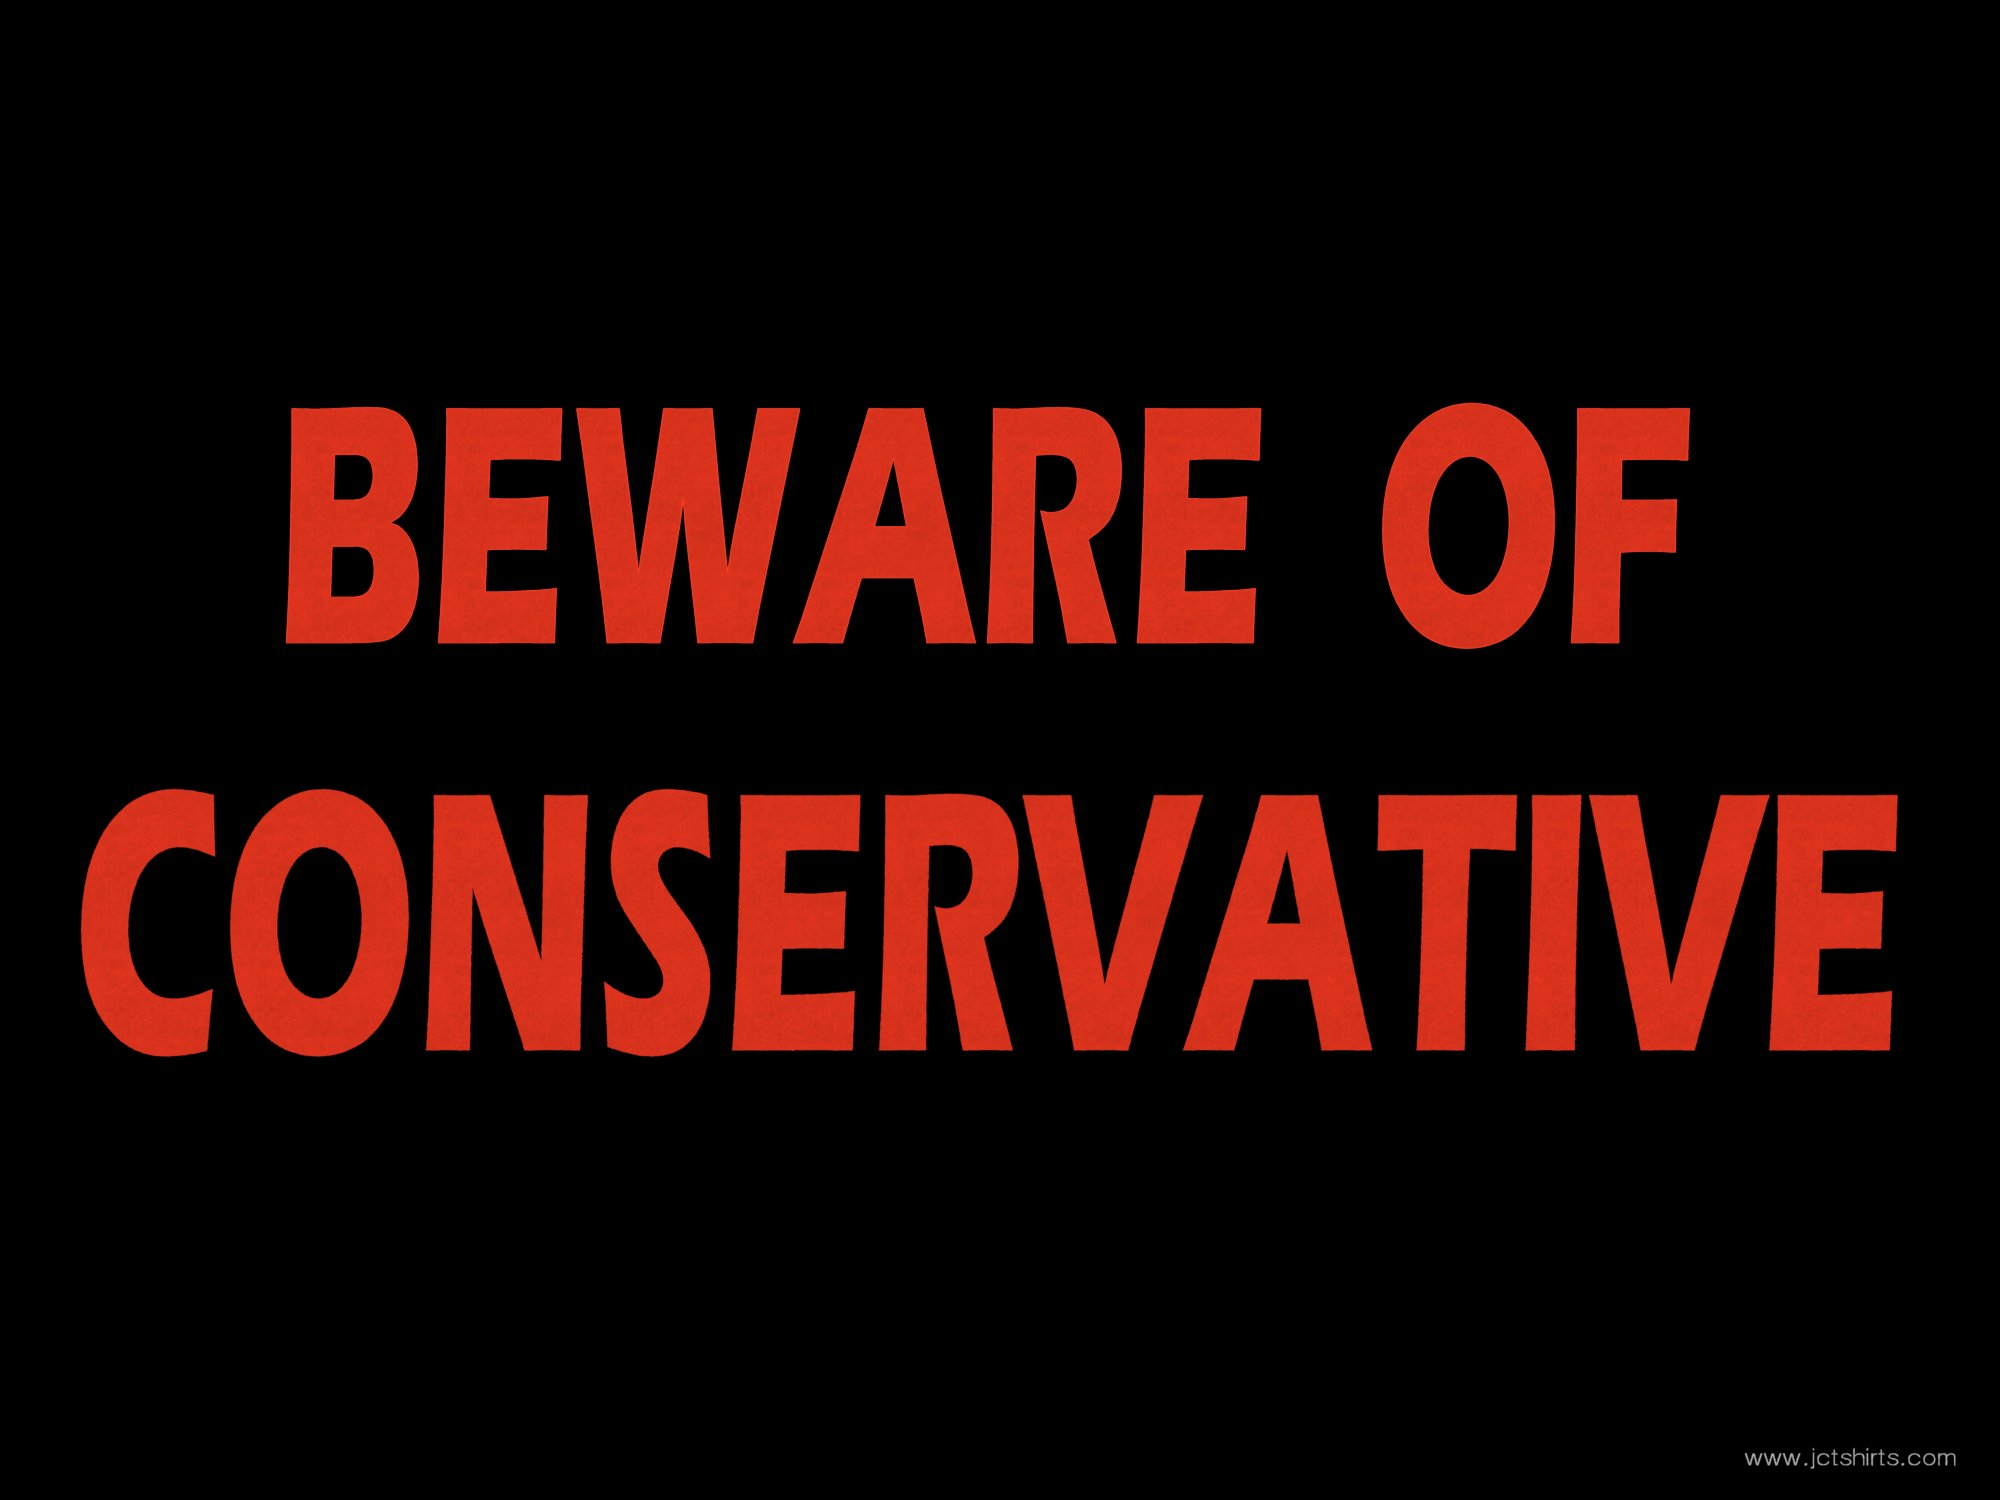 Beware of Conservative